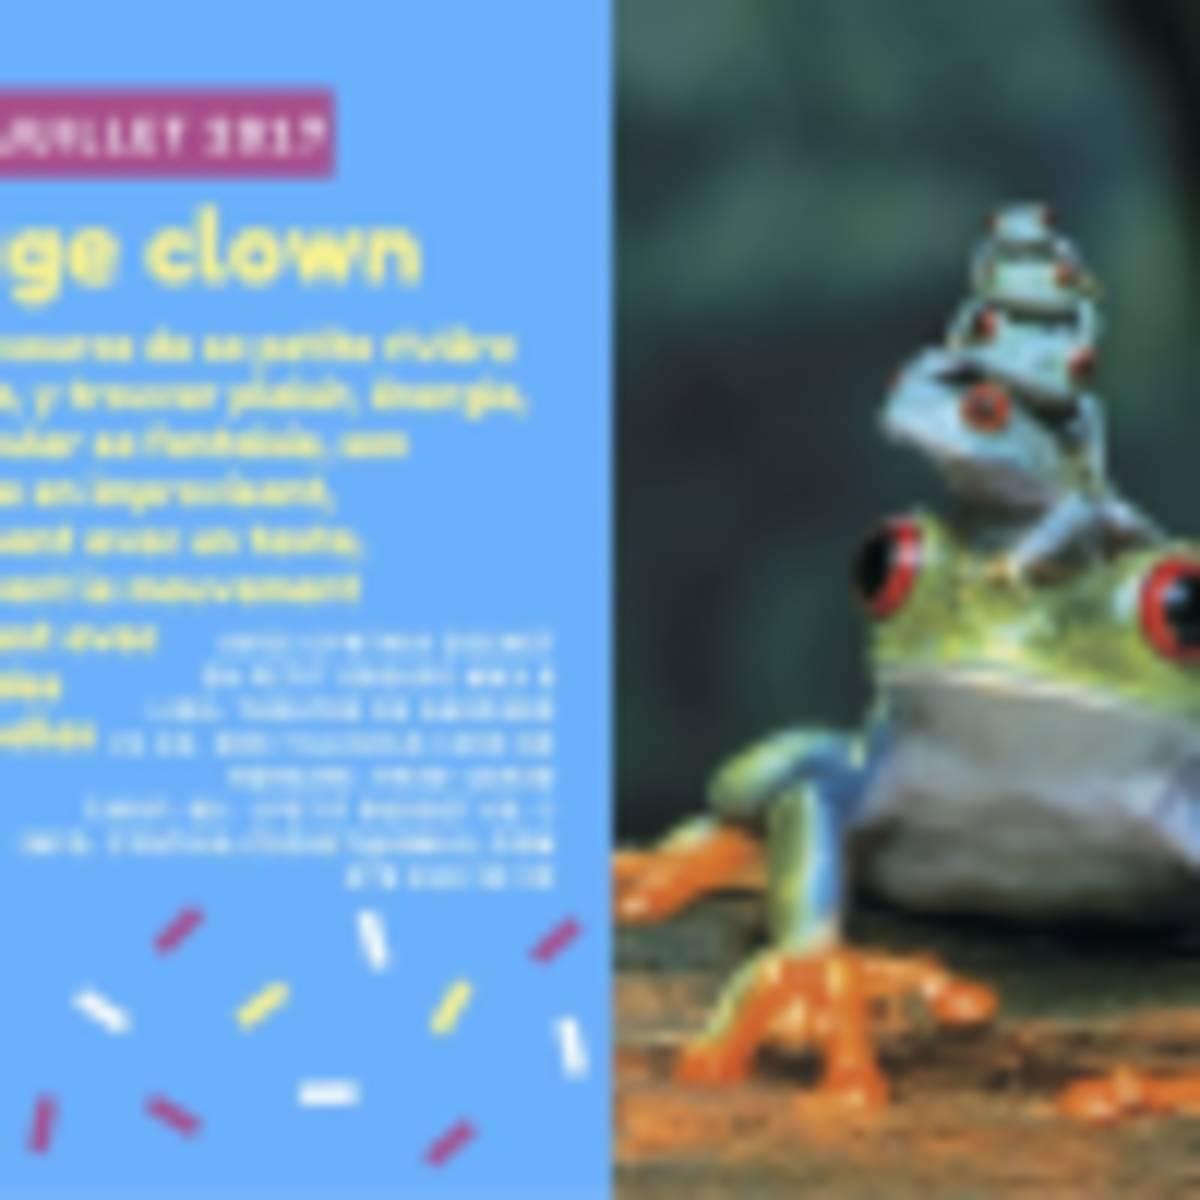 Stage Clown - Cynthia Cochet